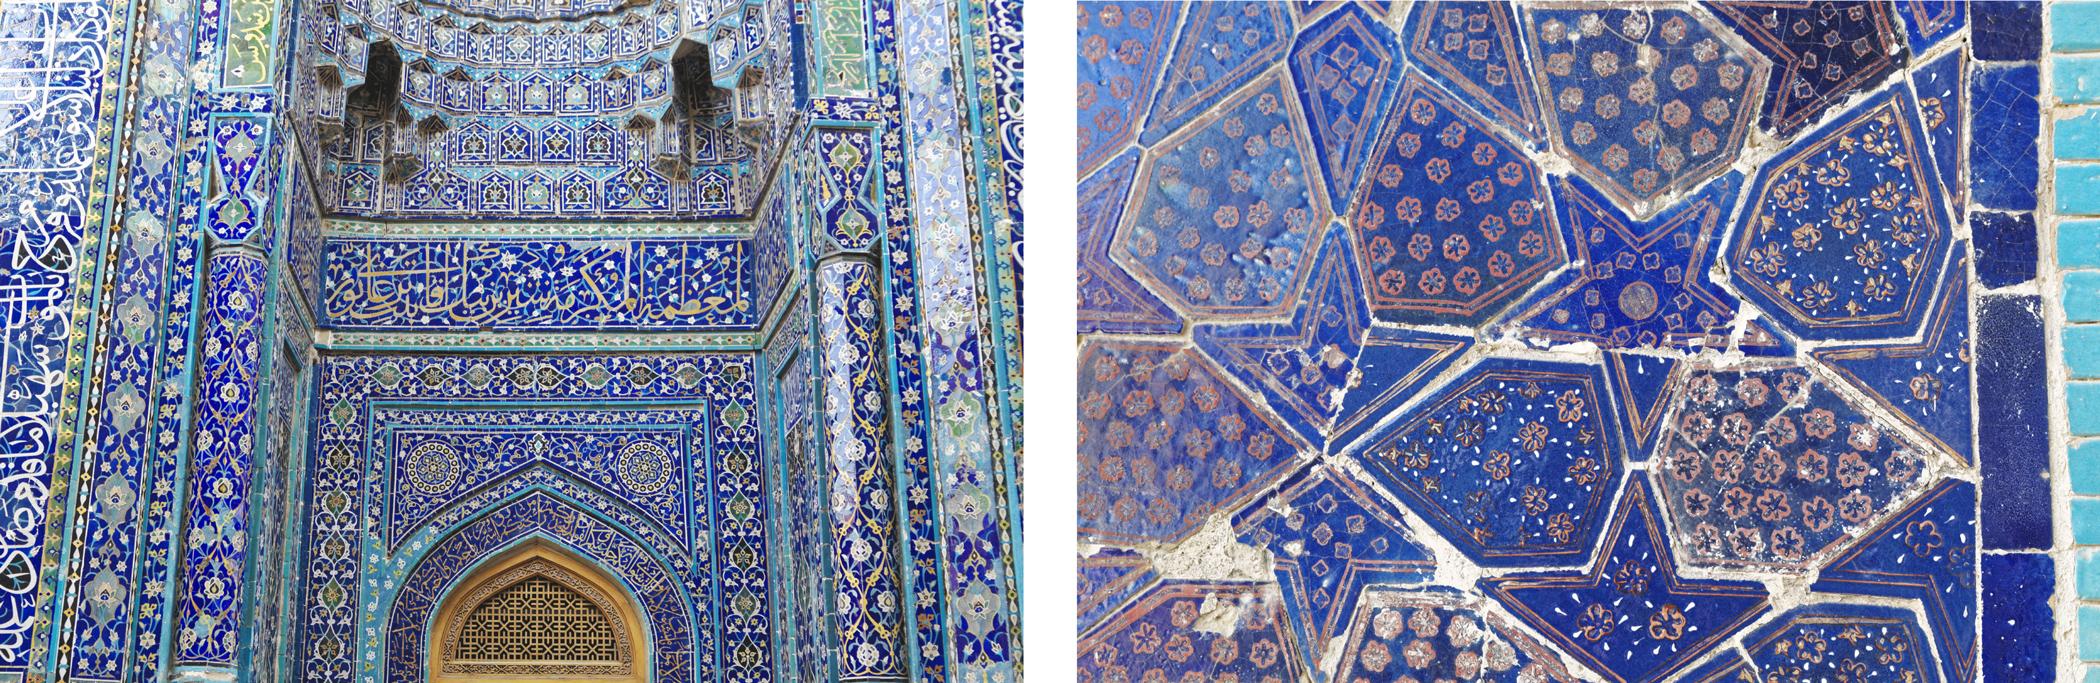 Nécropole Shah i Zinda Samarcande majoliques